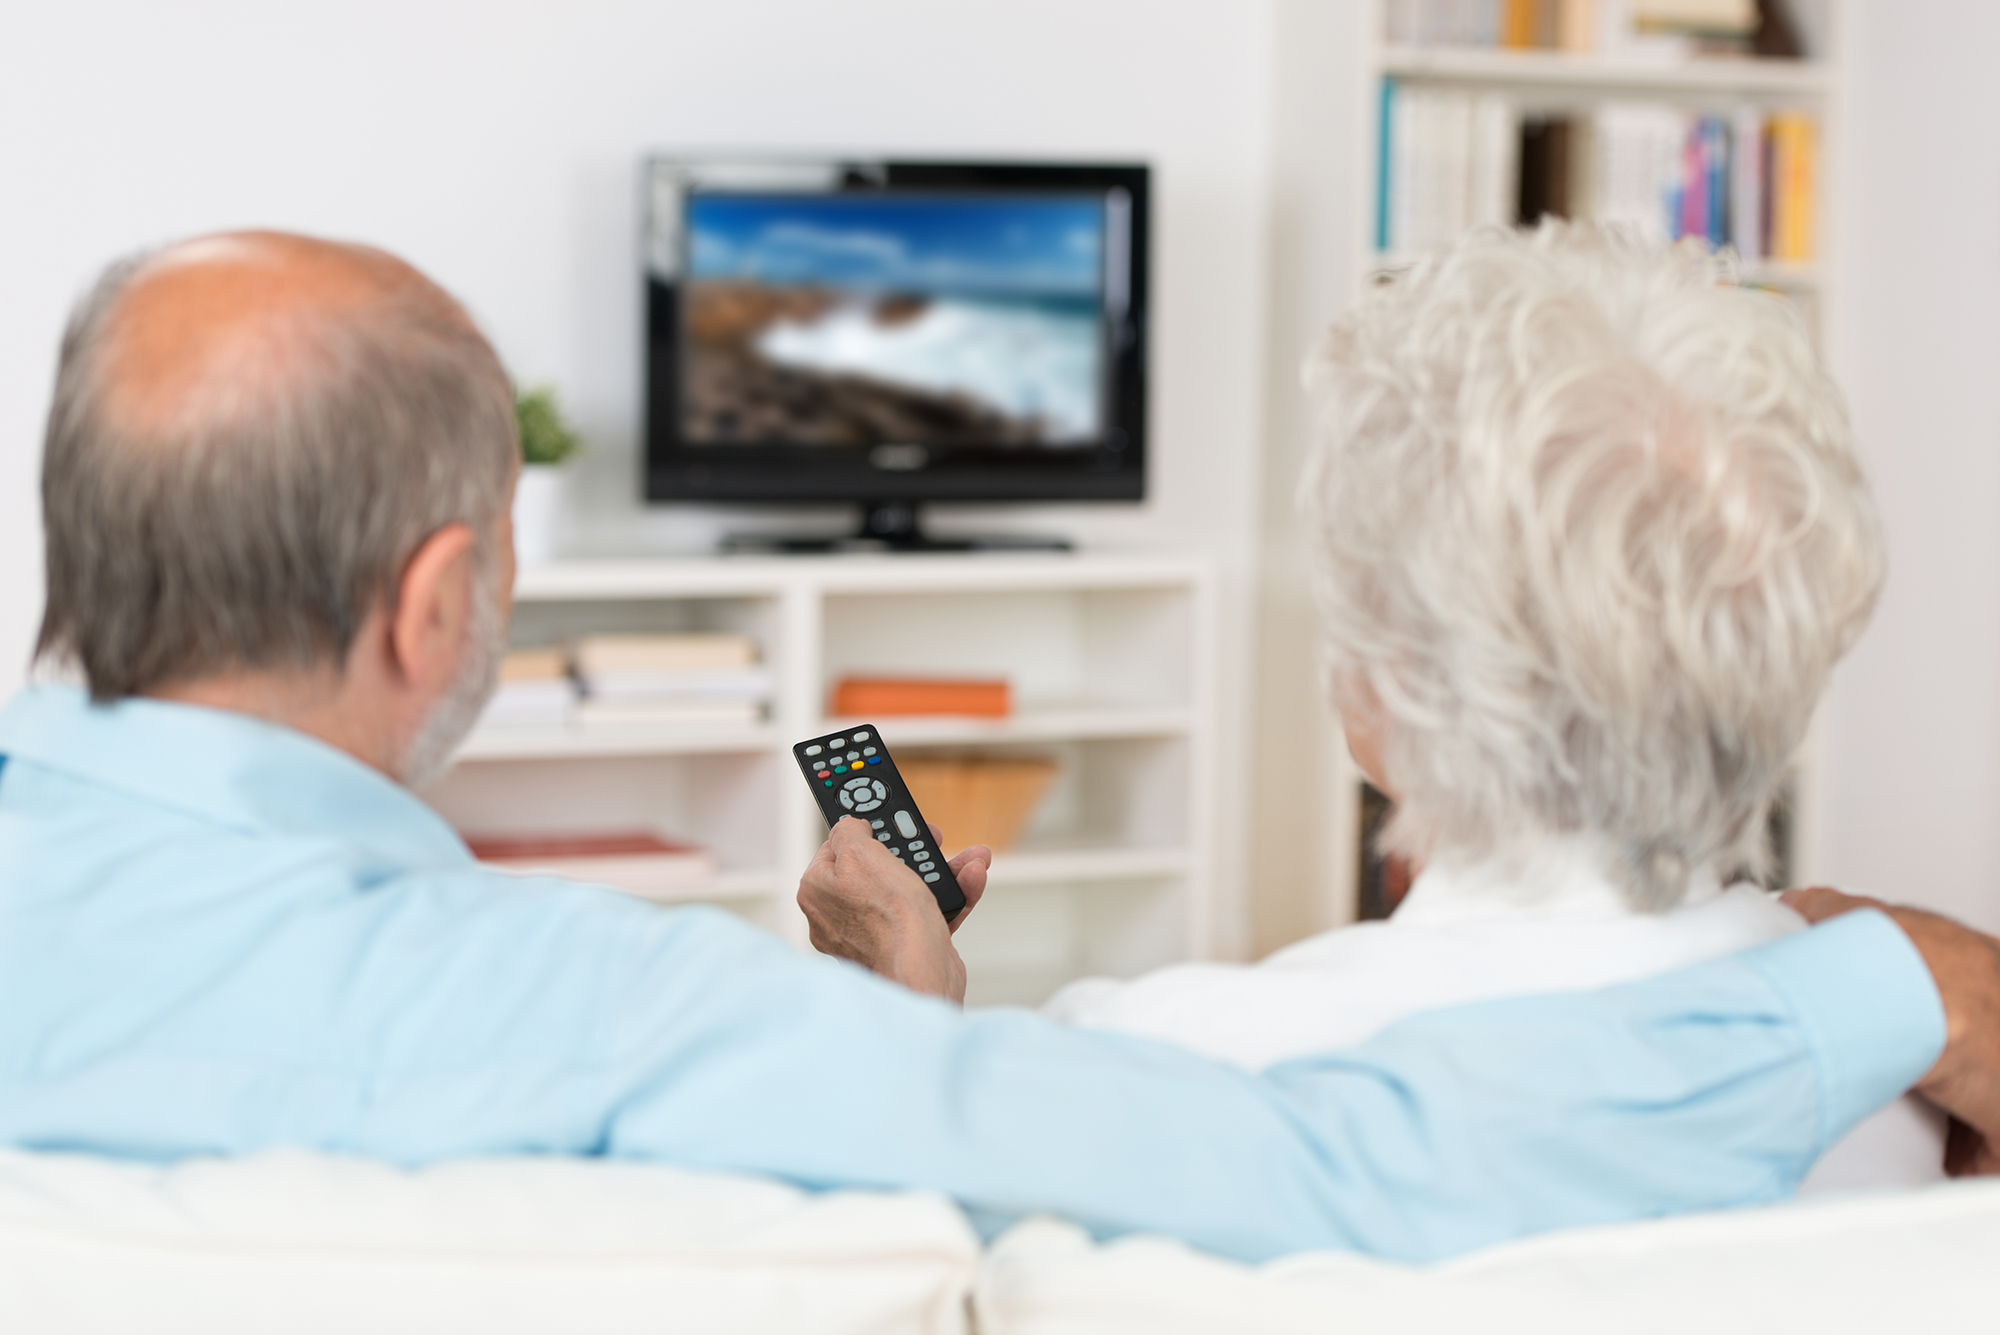 Elderly woman and man watching TV. (Image: Shutterstock)